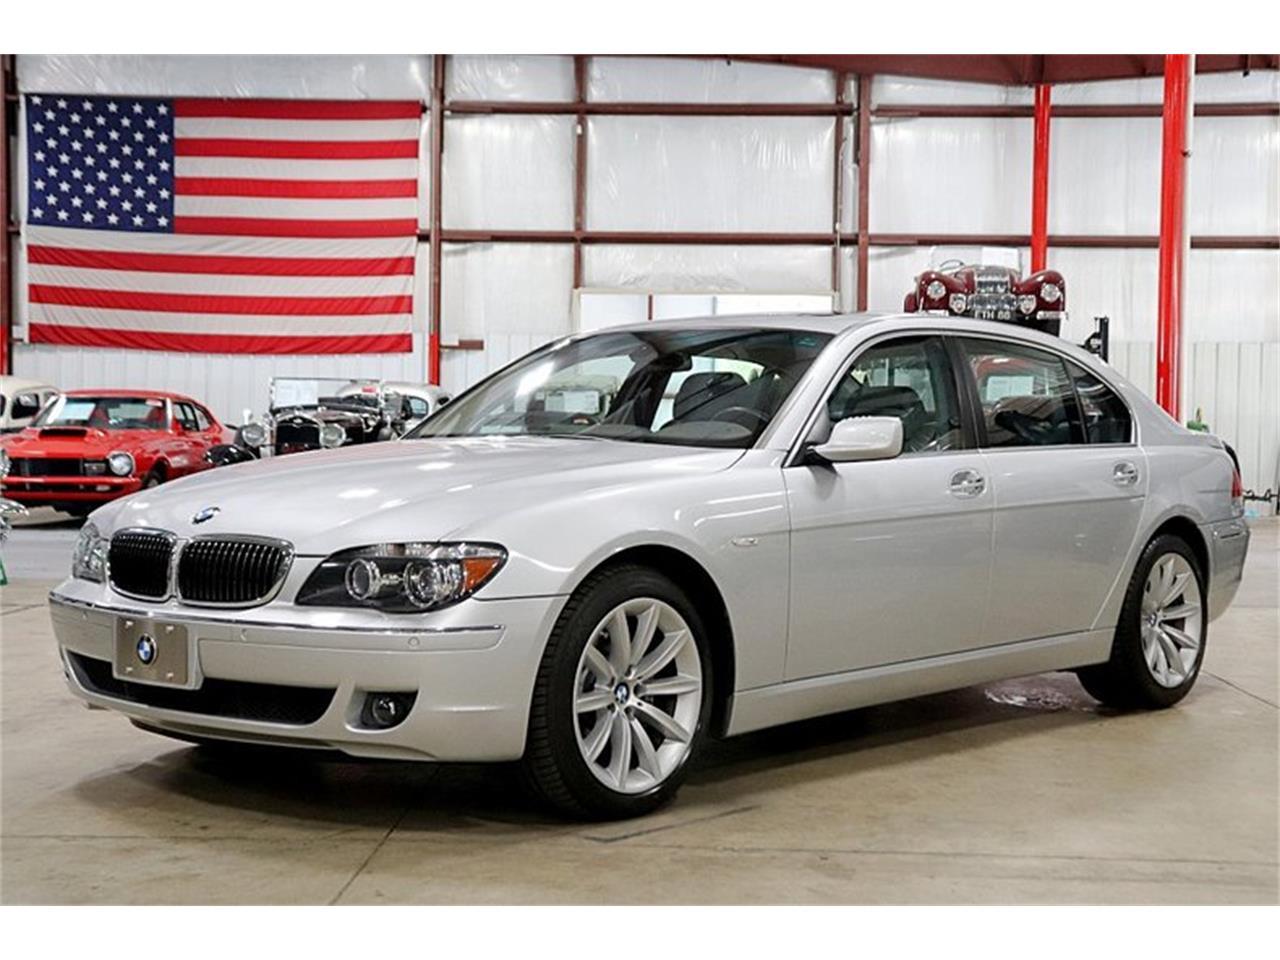 For Sale: 2008 BMW 750li in Kentwood, Michigan